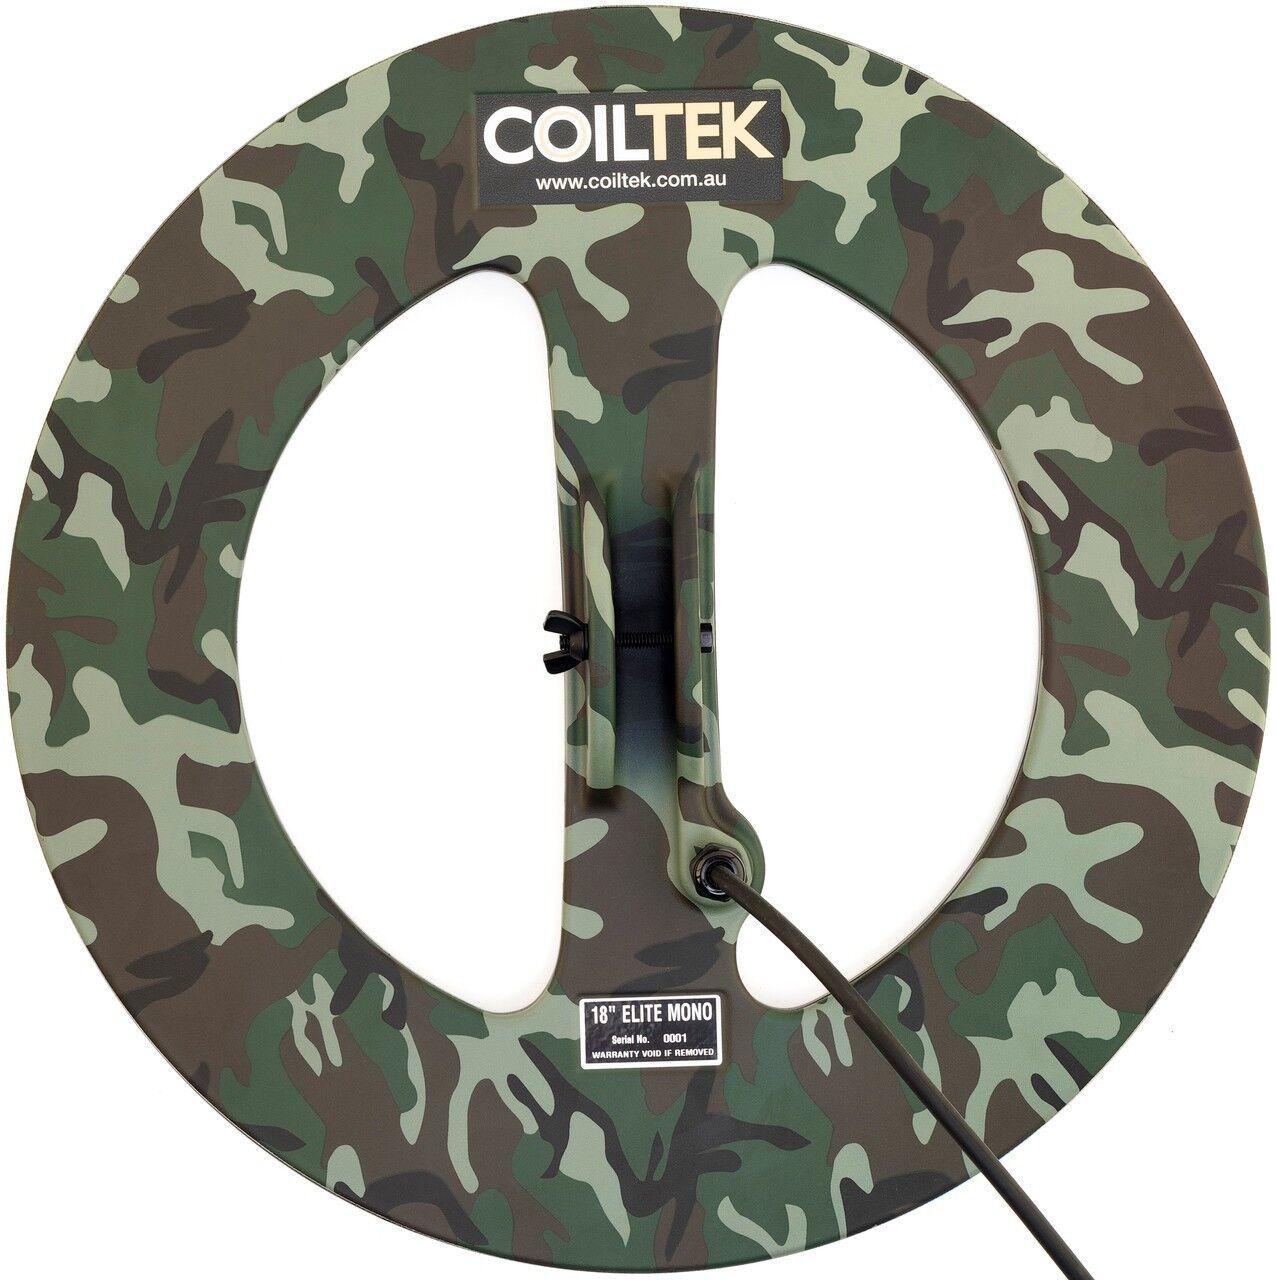 Coiltek 18-inch Round Mono Elite Searchcoil for Minelab SD, GP or GPX series